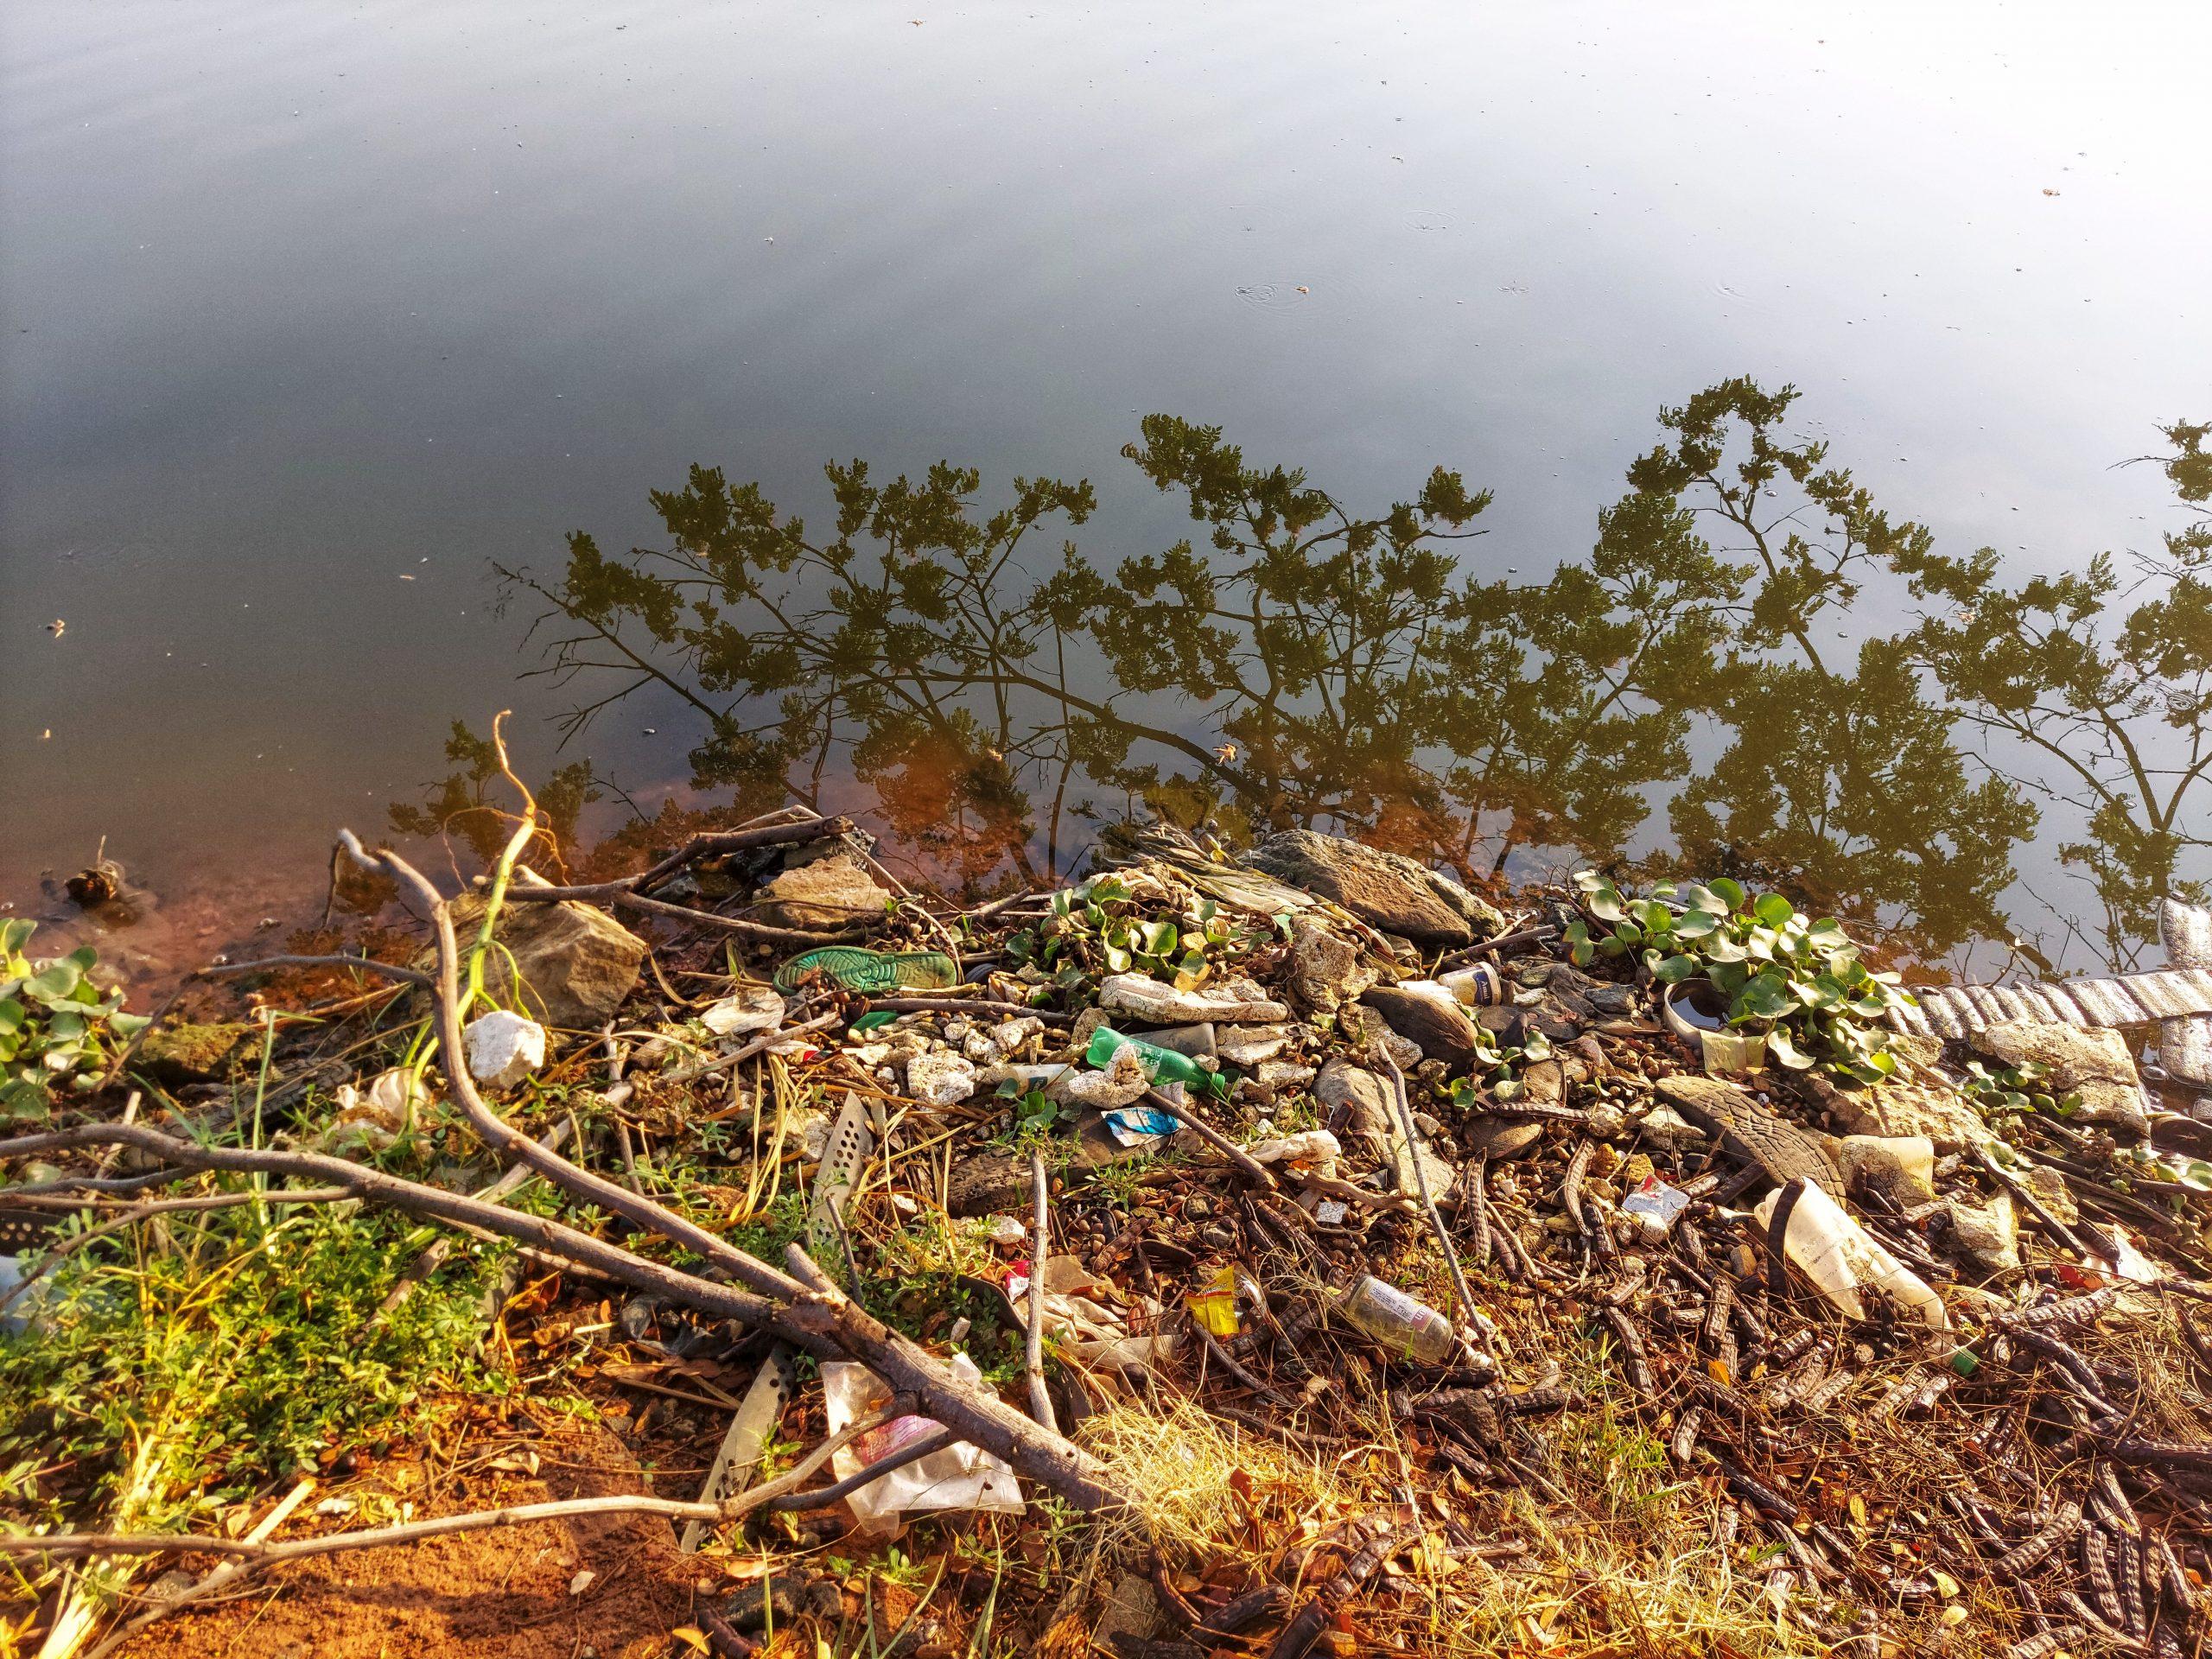 Garbage near a river